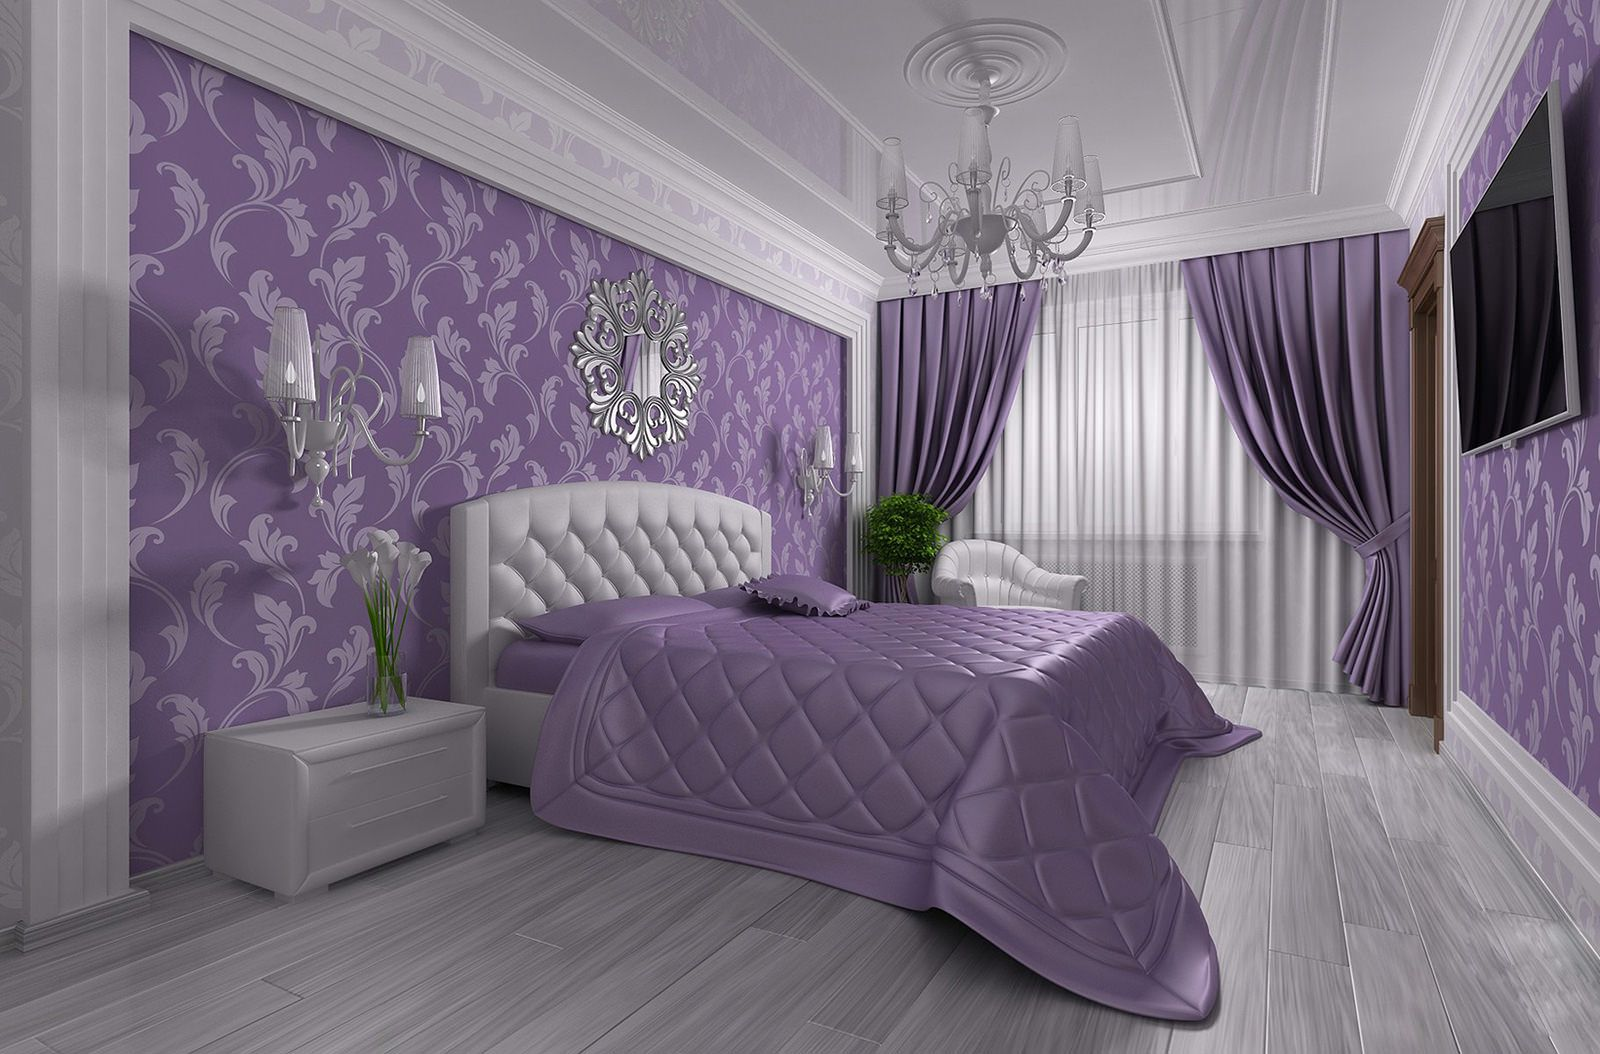 Сиреневое покрывало на кровати